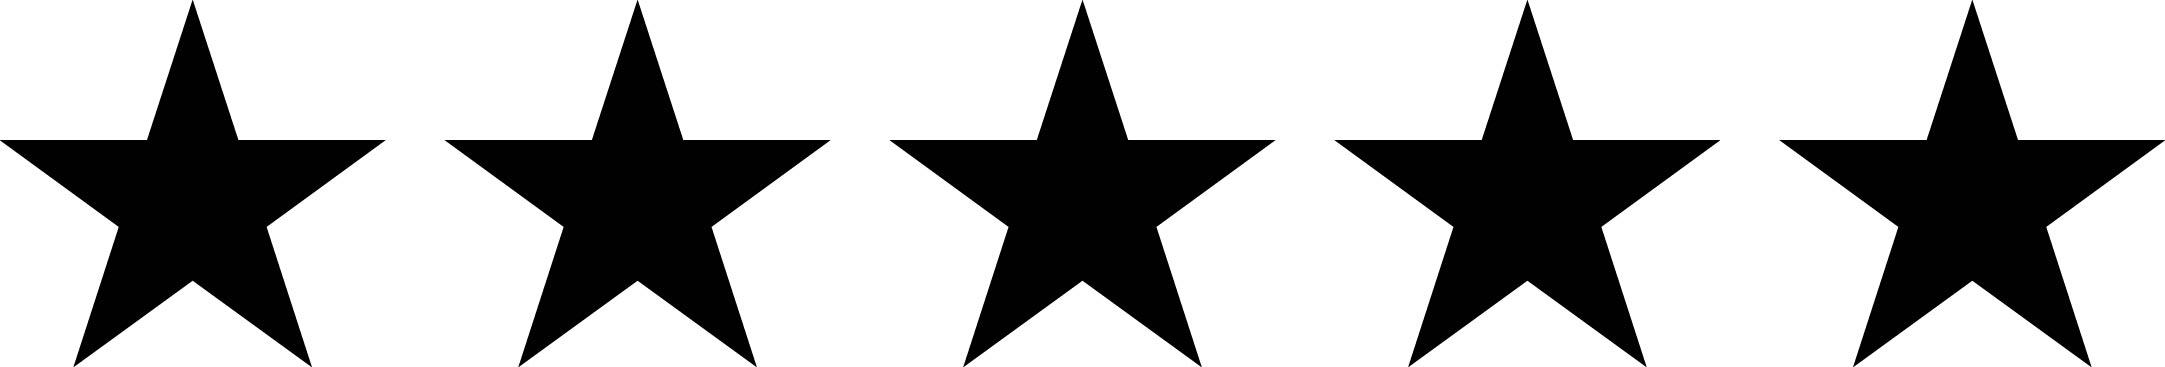 2165x367 Five Star Clip Art Clipart